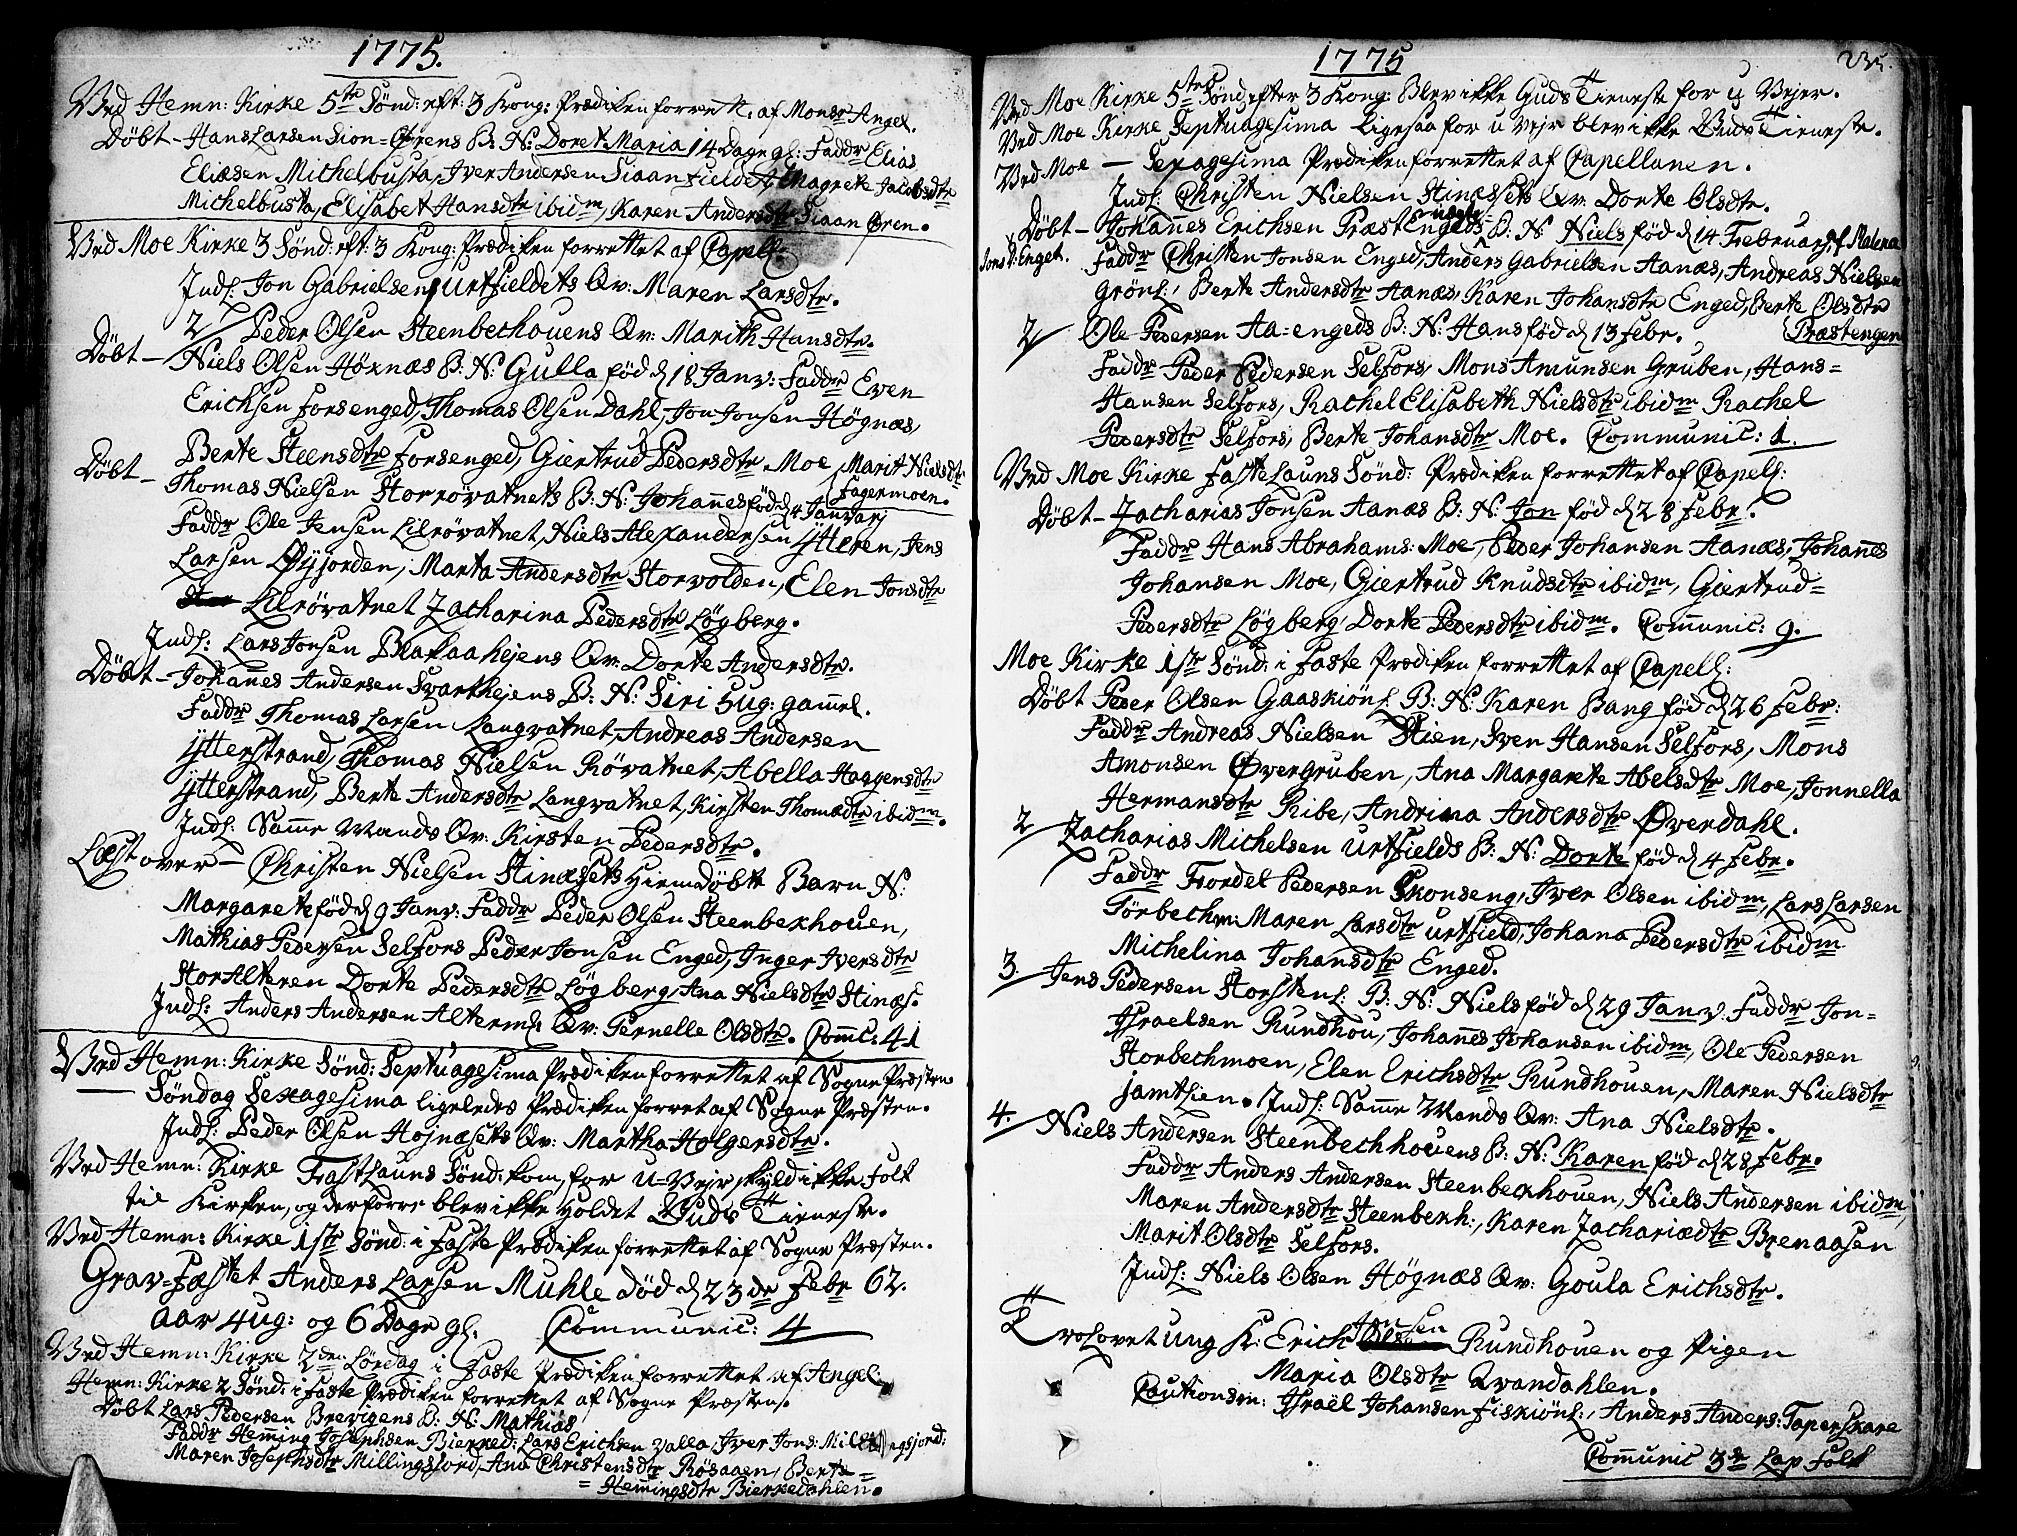 SAT, Ministerialprotokoller, klokkerbøker og fødselsregistre - Nordland, 825/L0348: Ministerialbok nr. 825A04, 1752-1788, s. 235